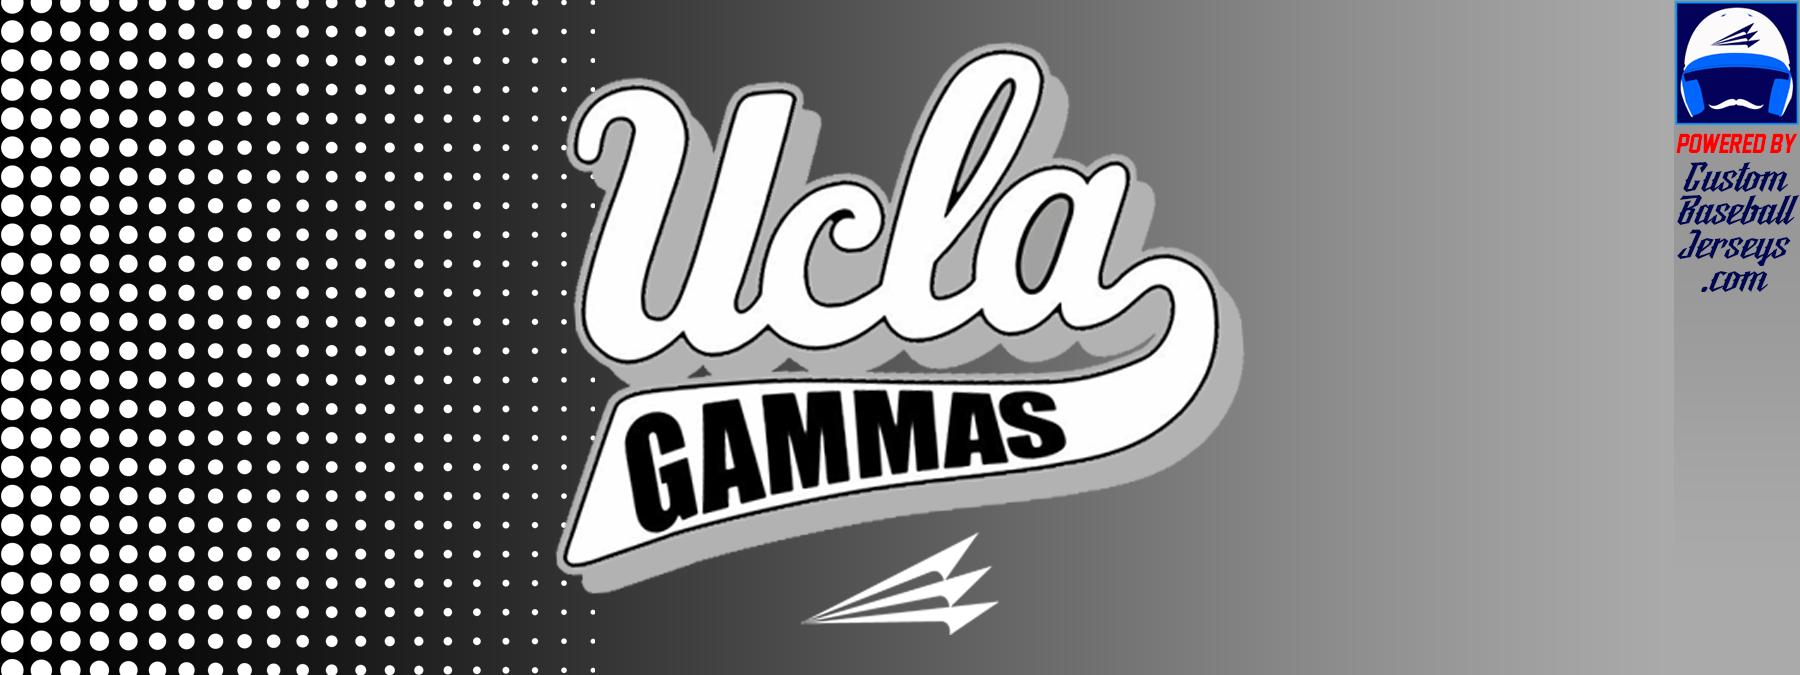 new styles b0e62 2ce80 UCLA Gammas Custom Throwback Baseball Jerseys - Custom ...